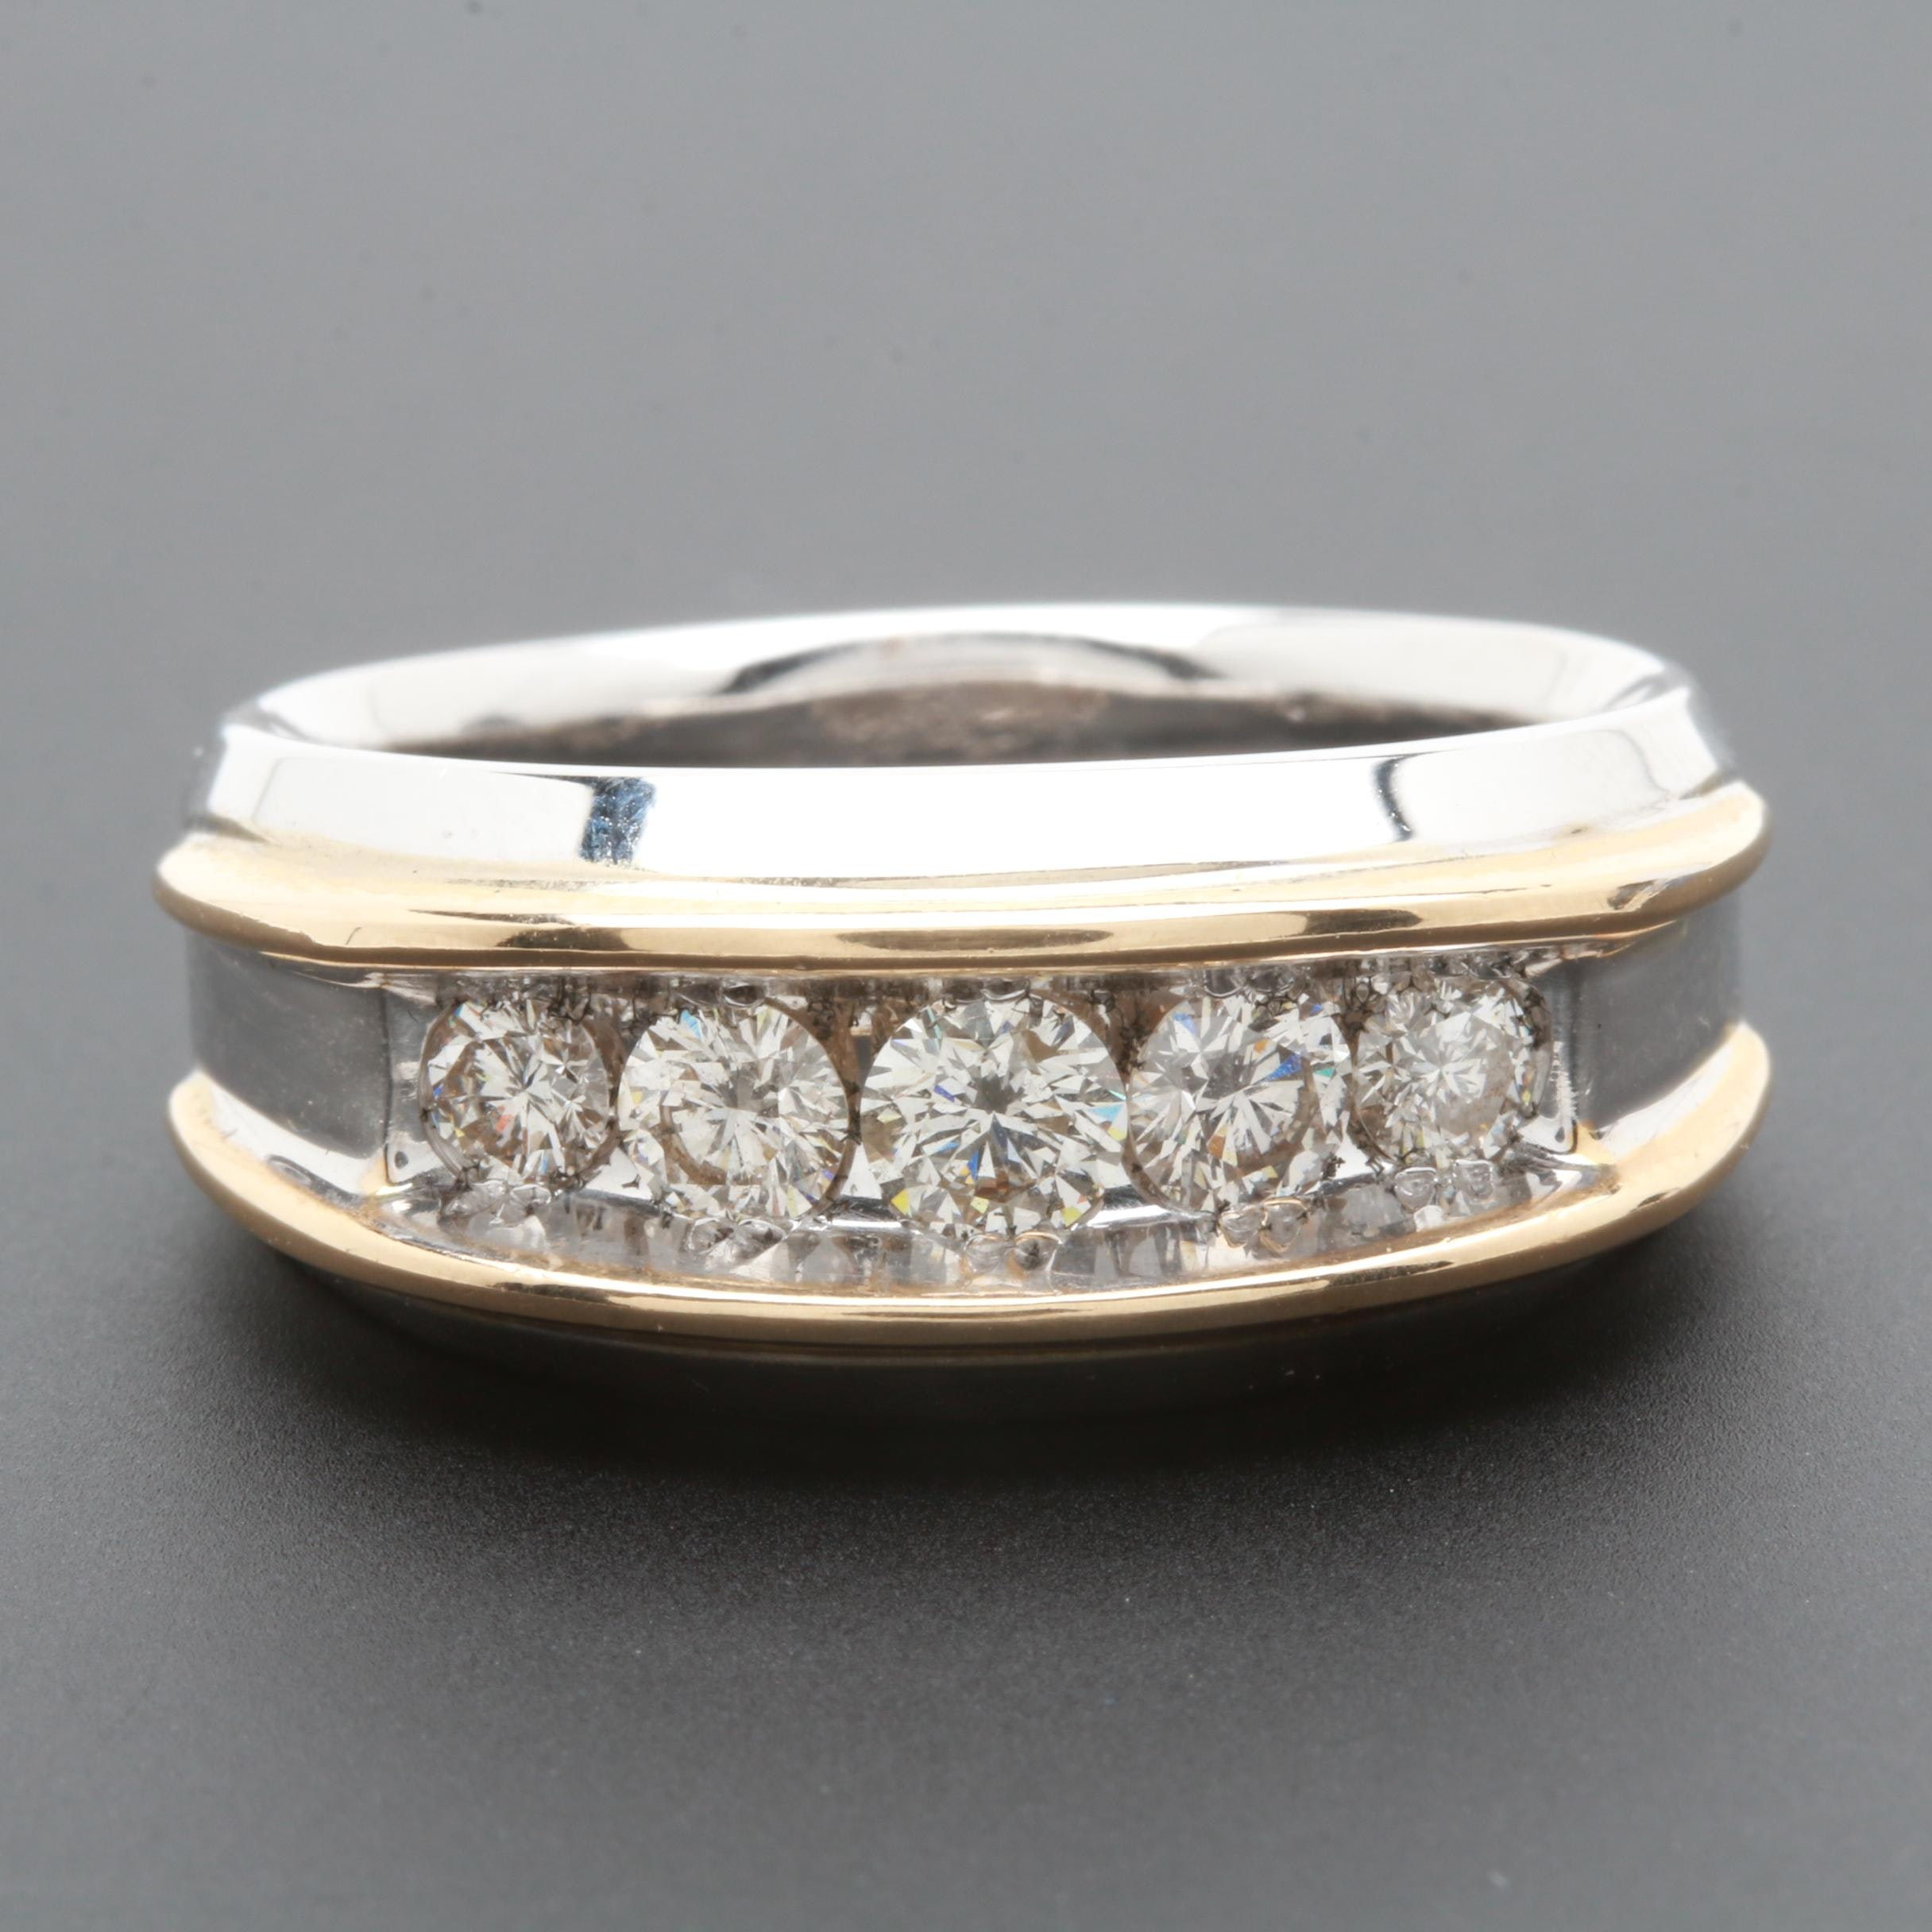 IBGoodman 14K White Gold 0.96 CTW Diamond Ring with White Gold Accents